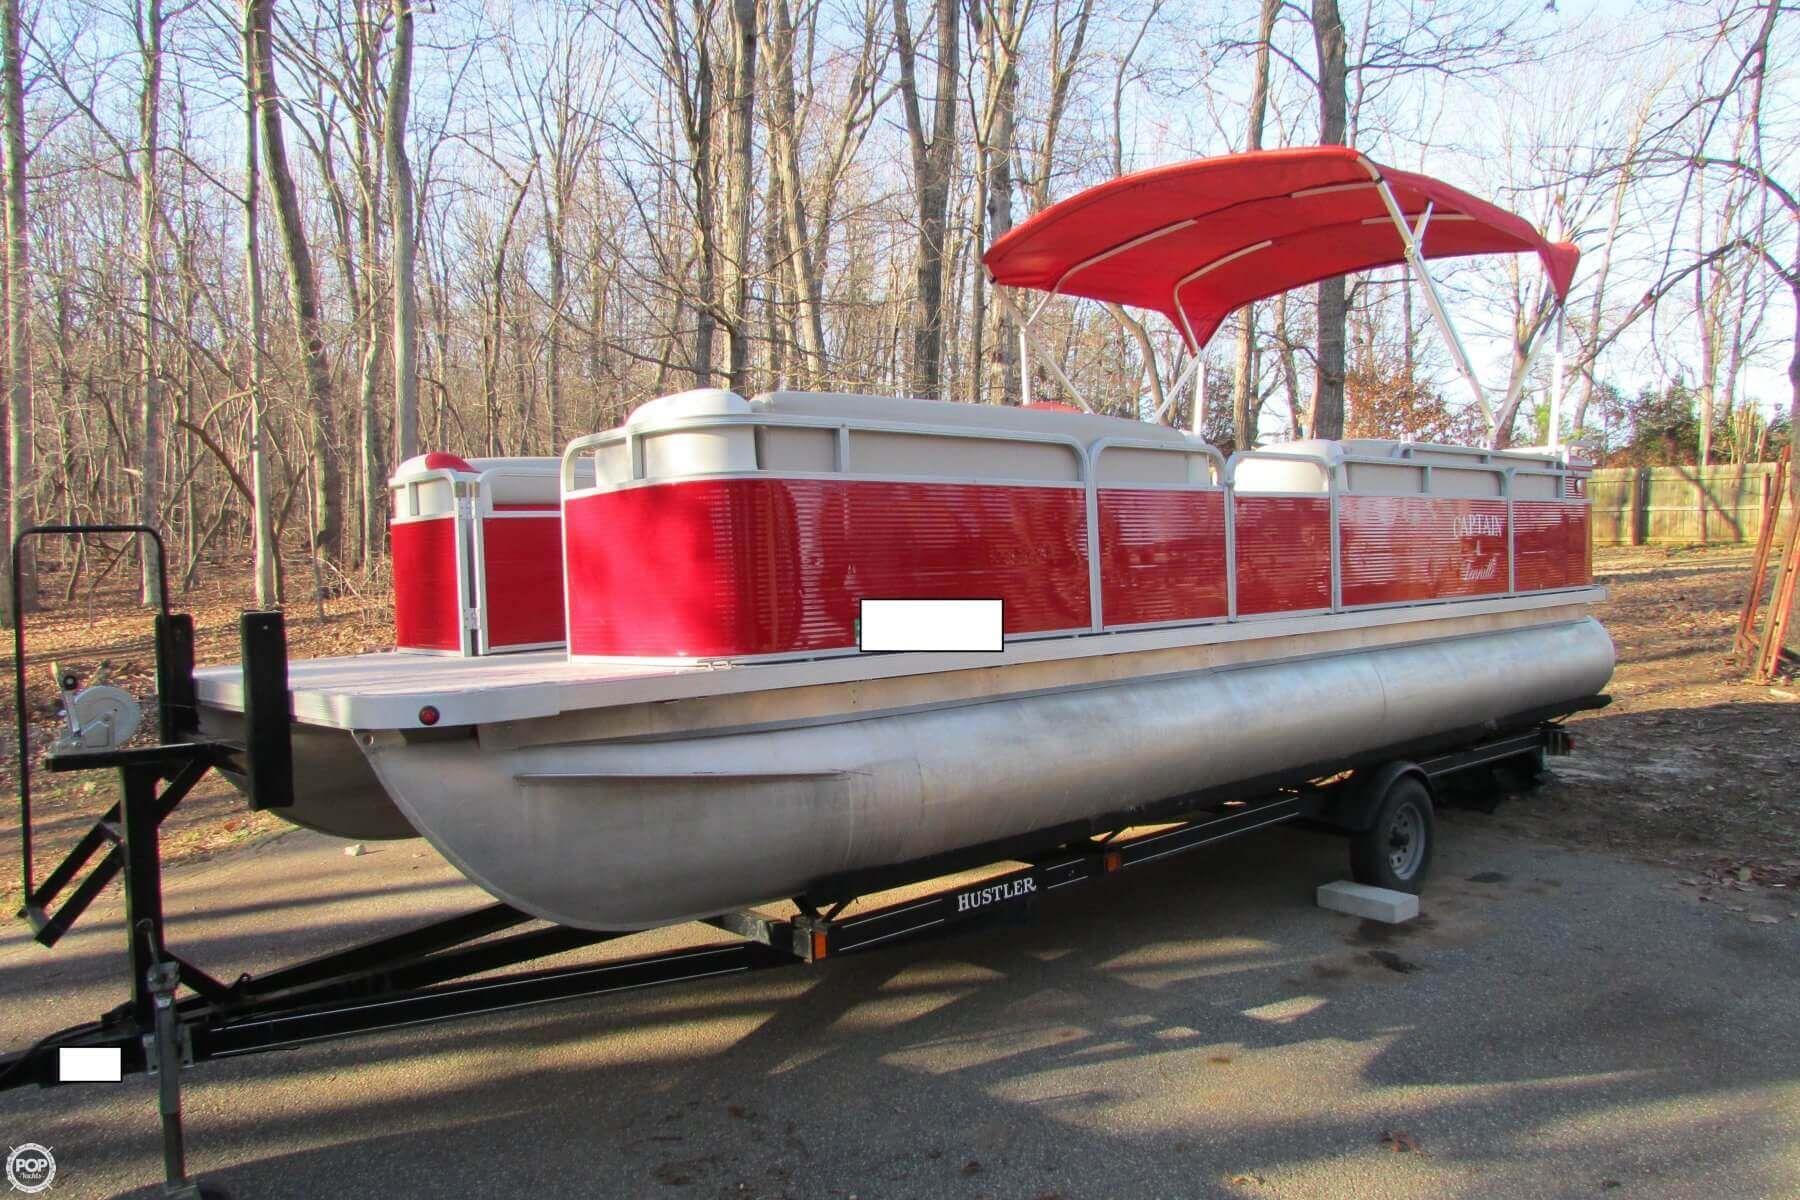 43+ Smoker craft boats near me ideas in 2021